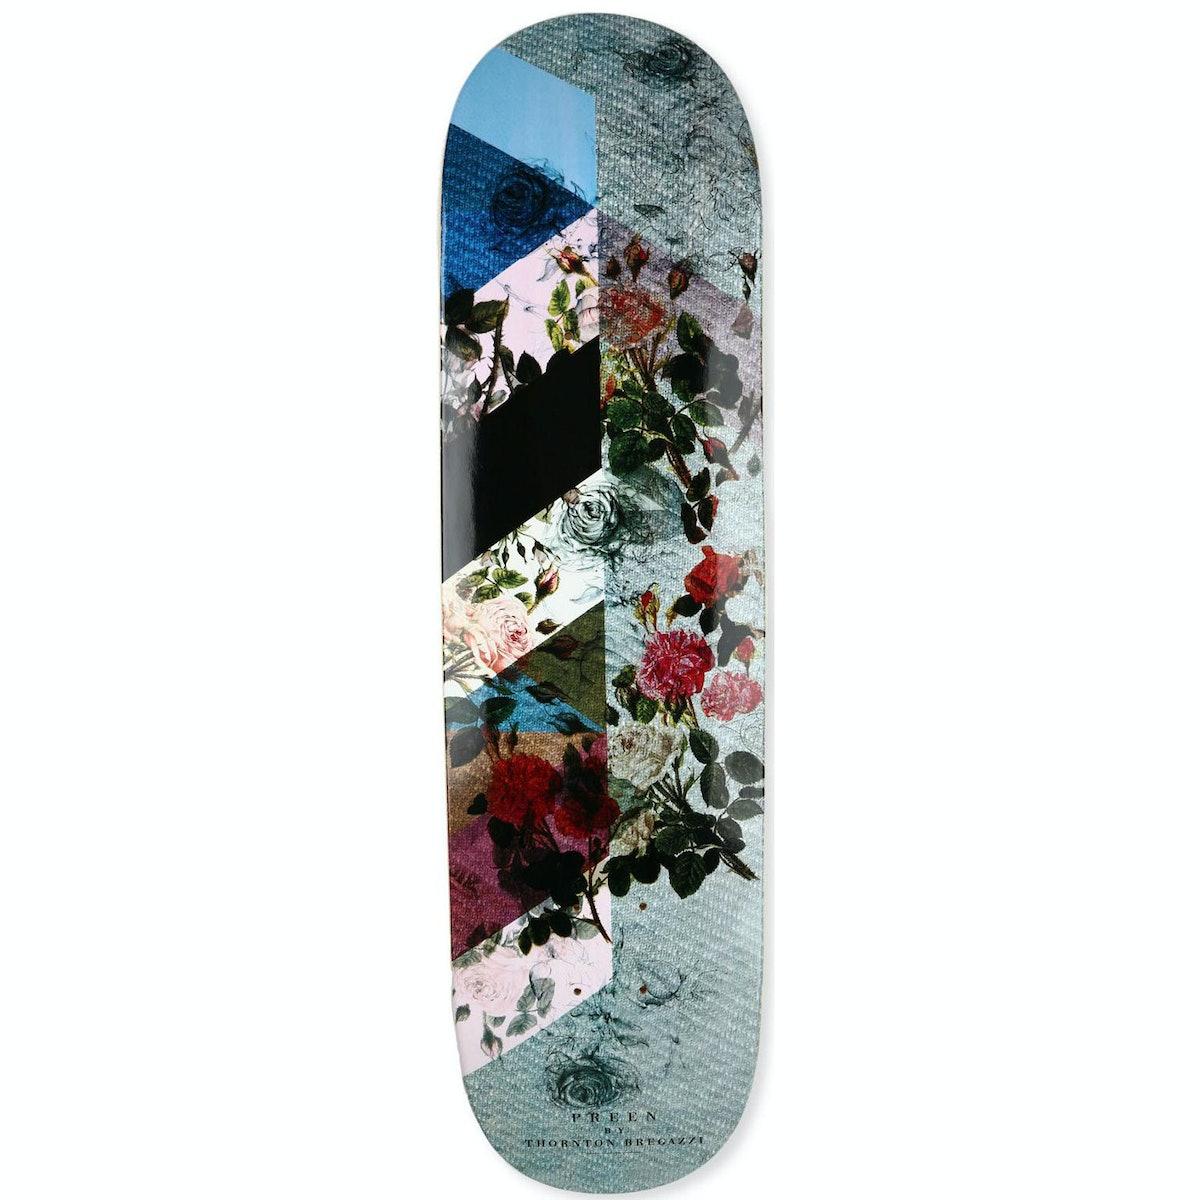 Preen Skateboard